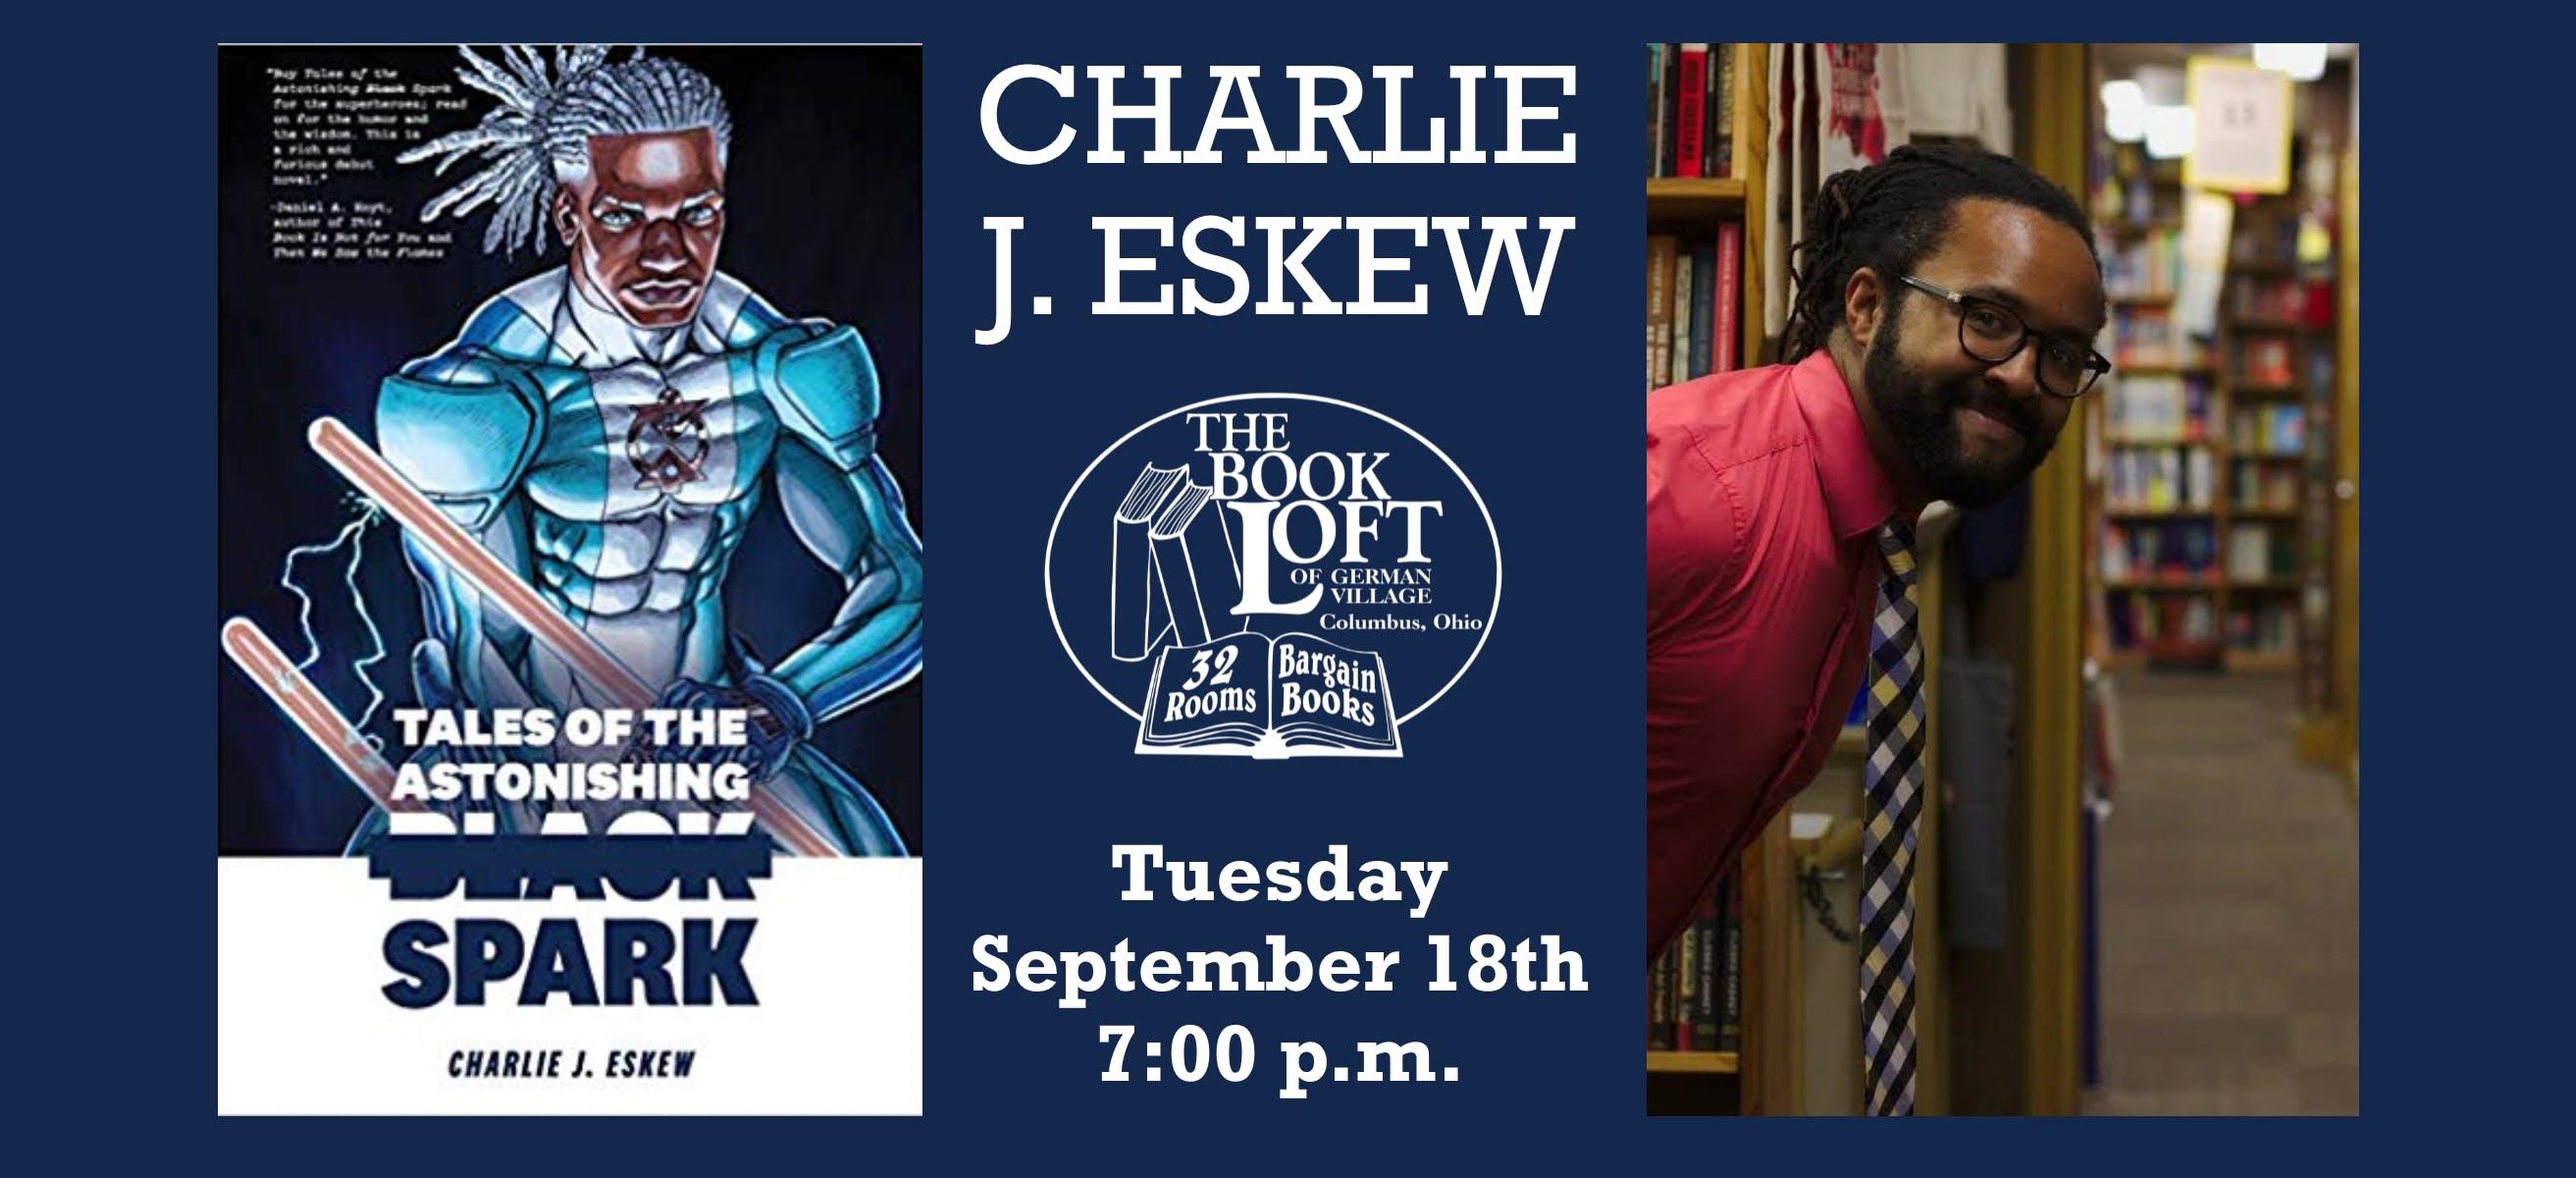 Charlie J. Eskew - Tales of The Astonishing B